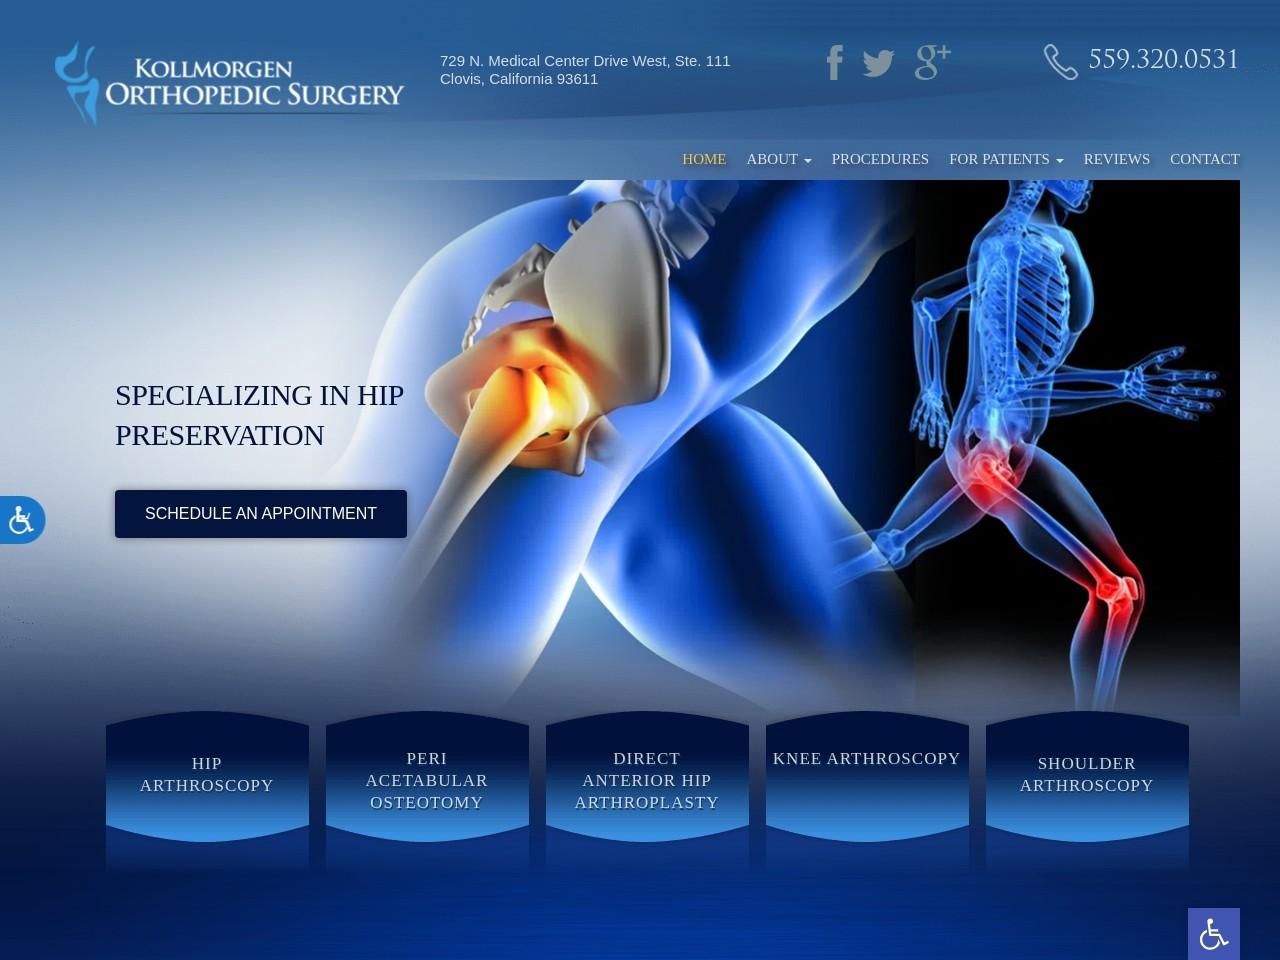 kollmorgen orthodontics website screenshot